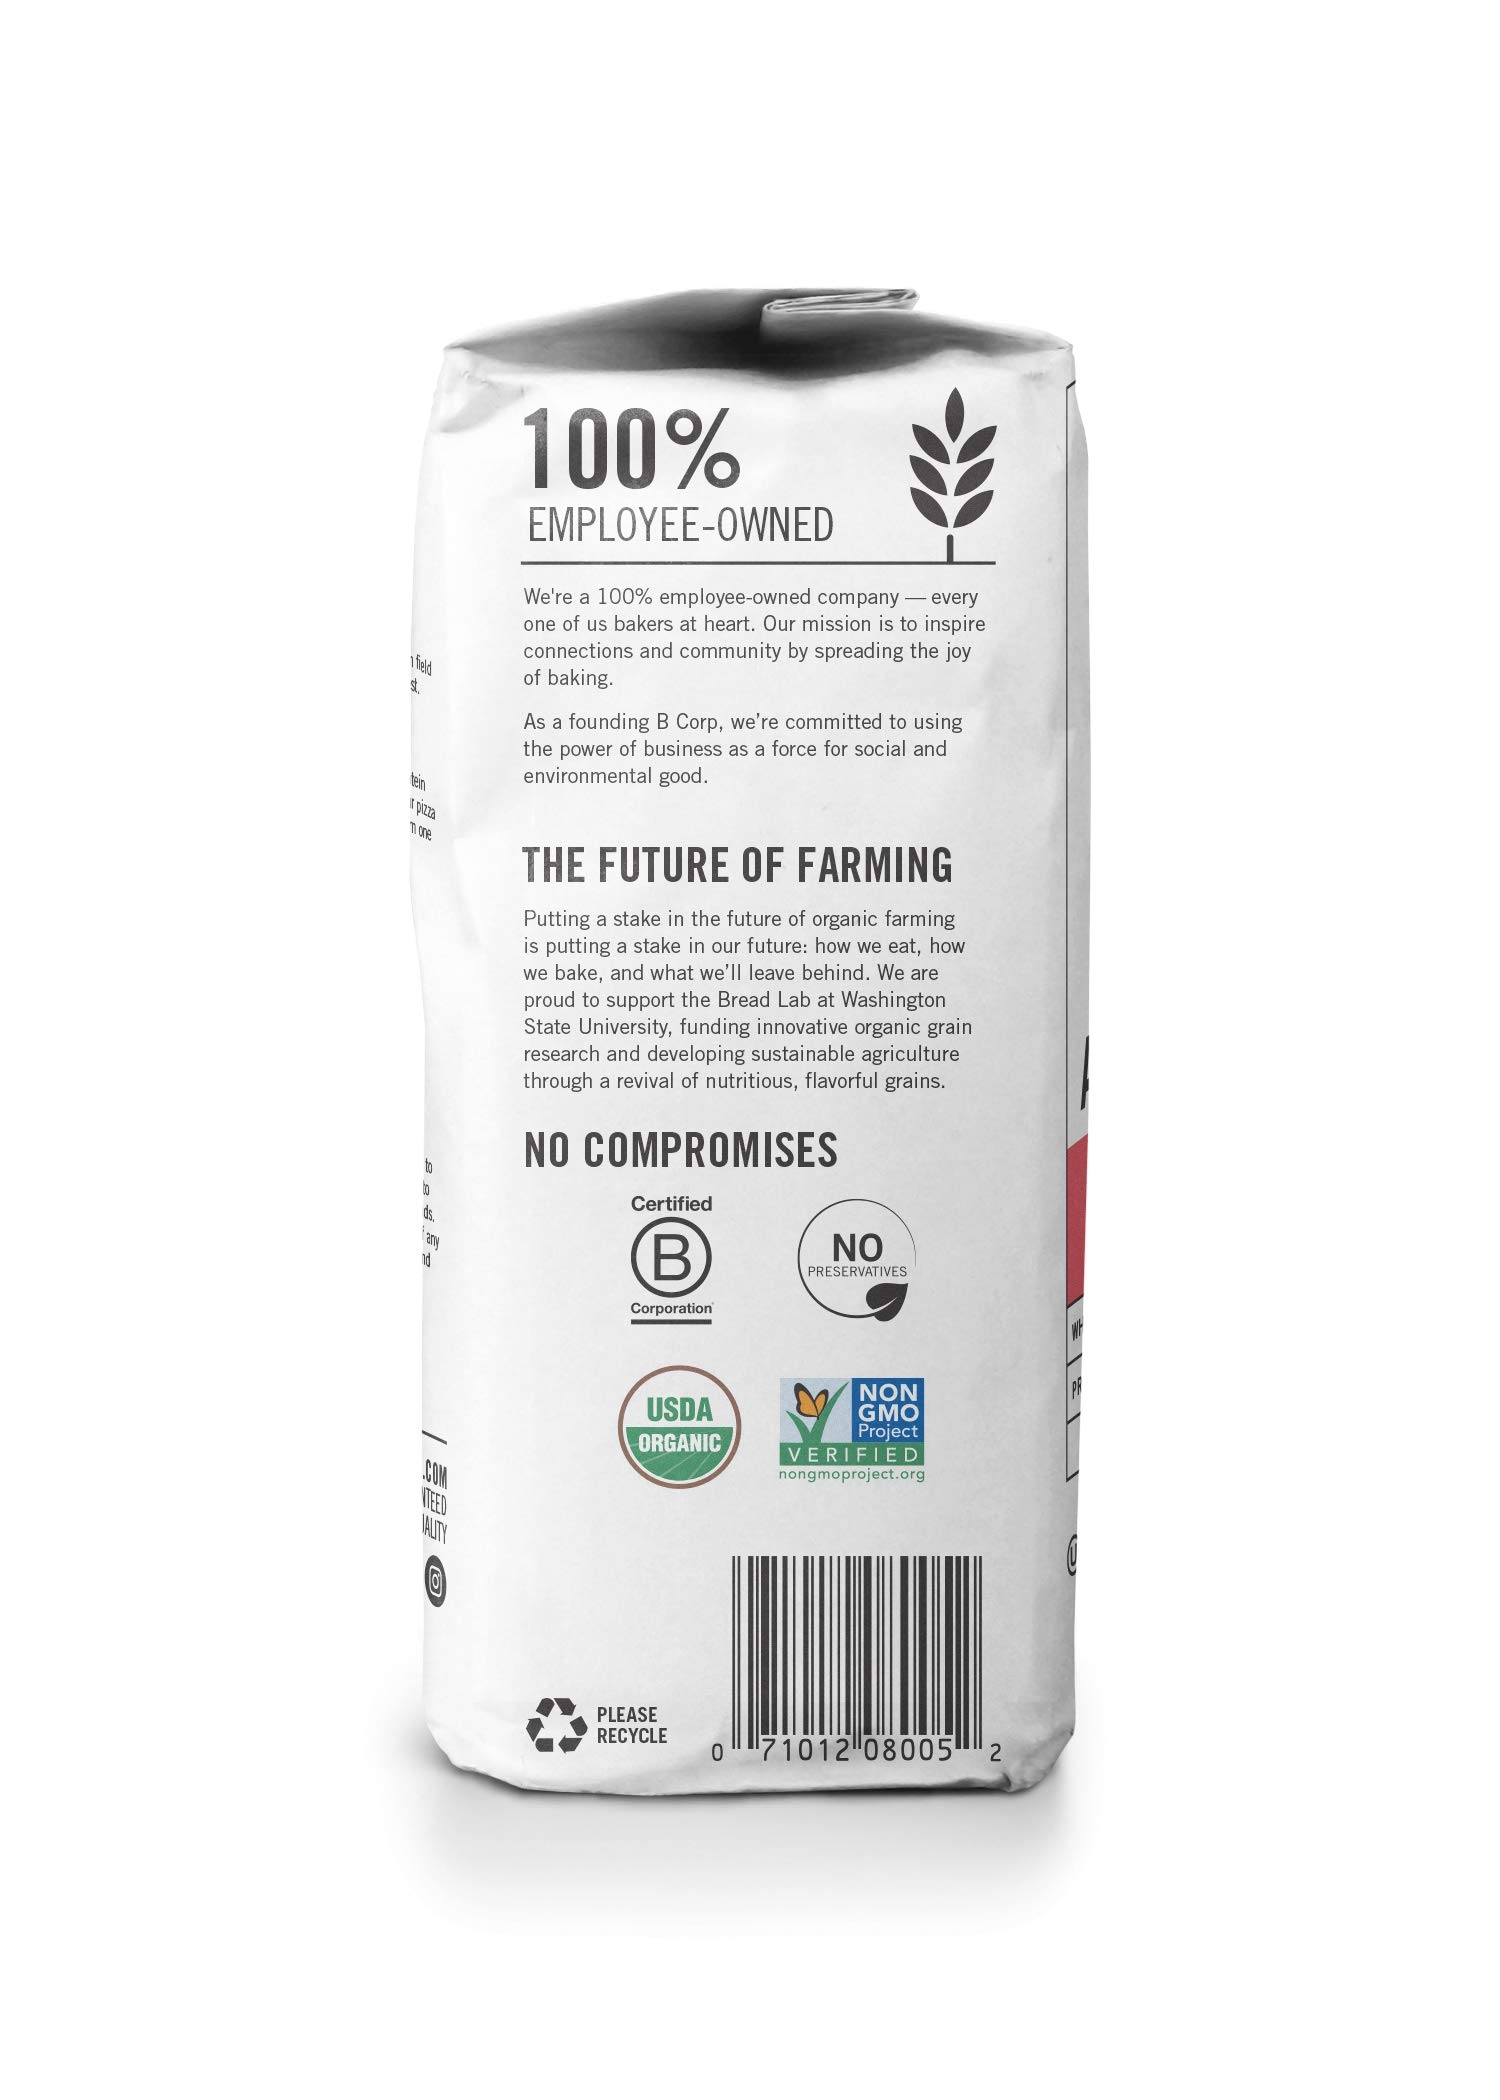 King Arthur Flour 100% Organic All-Purpose Flour, Unbleached, 2 Pound (Pack of 12) by King Arthur Flour (Image #4)